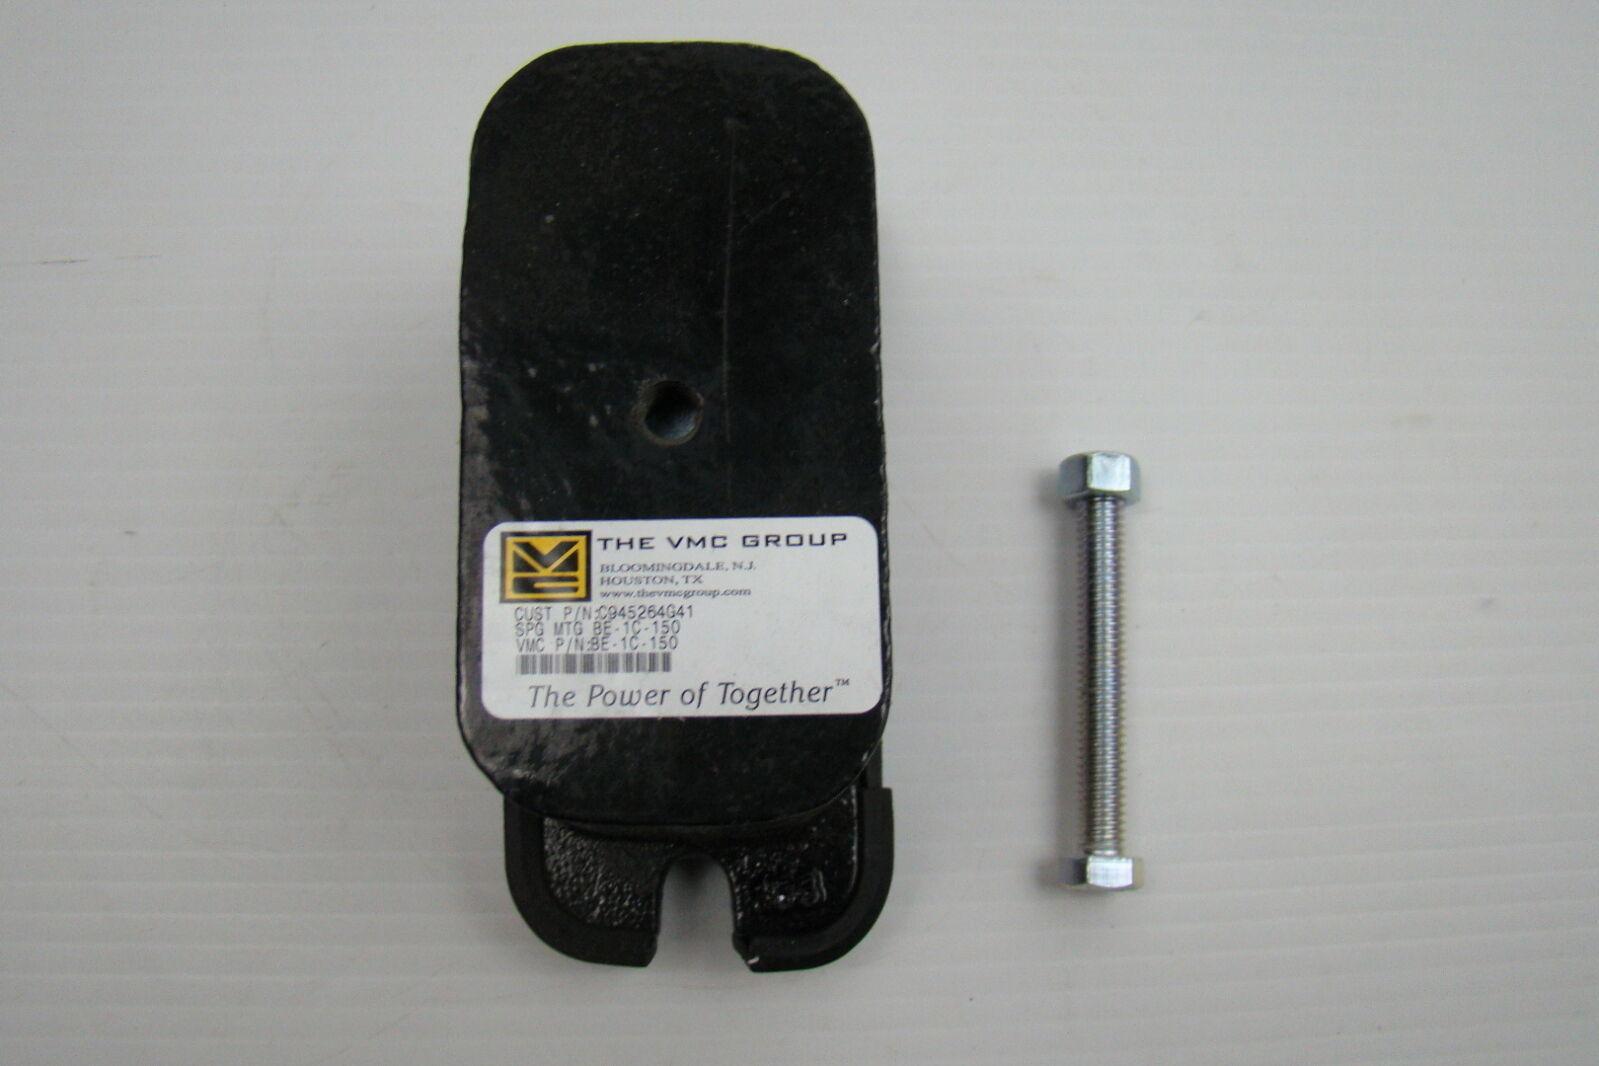 Vmc Group Spring Mounts Vibration Isolator C945264g41 Ebay